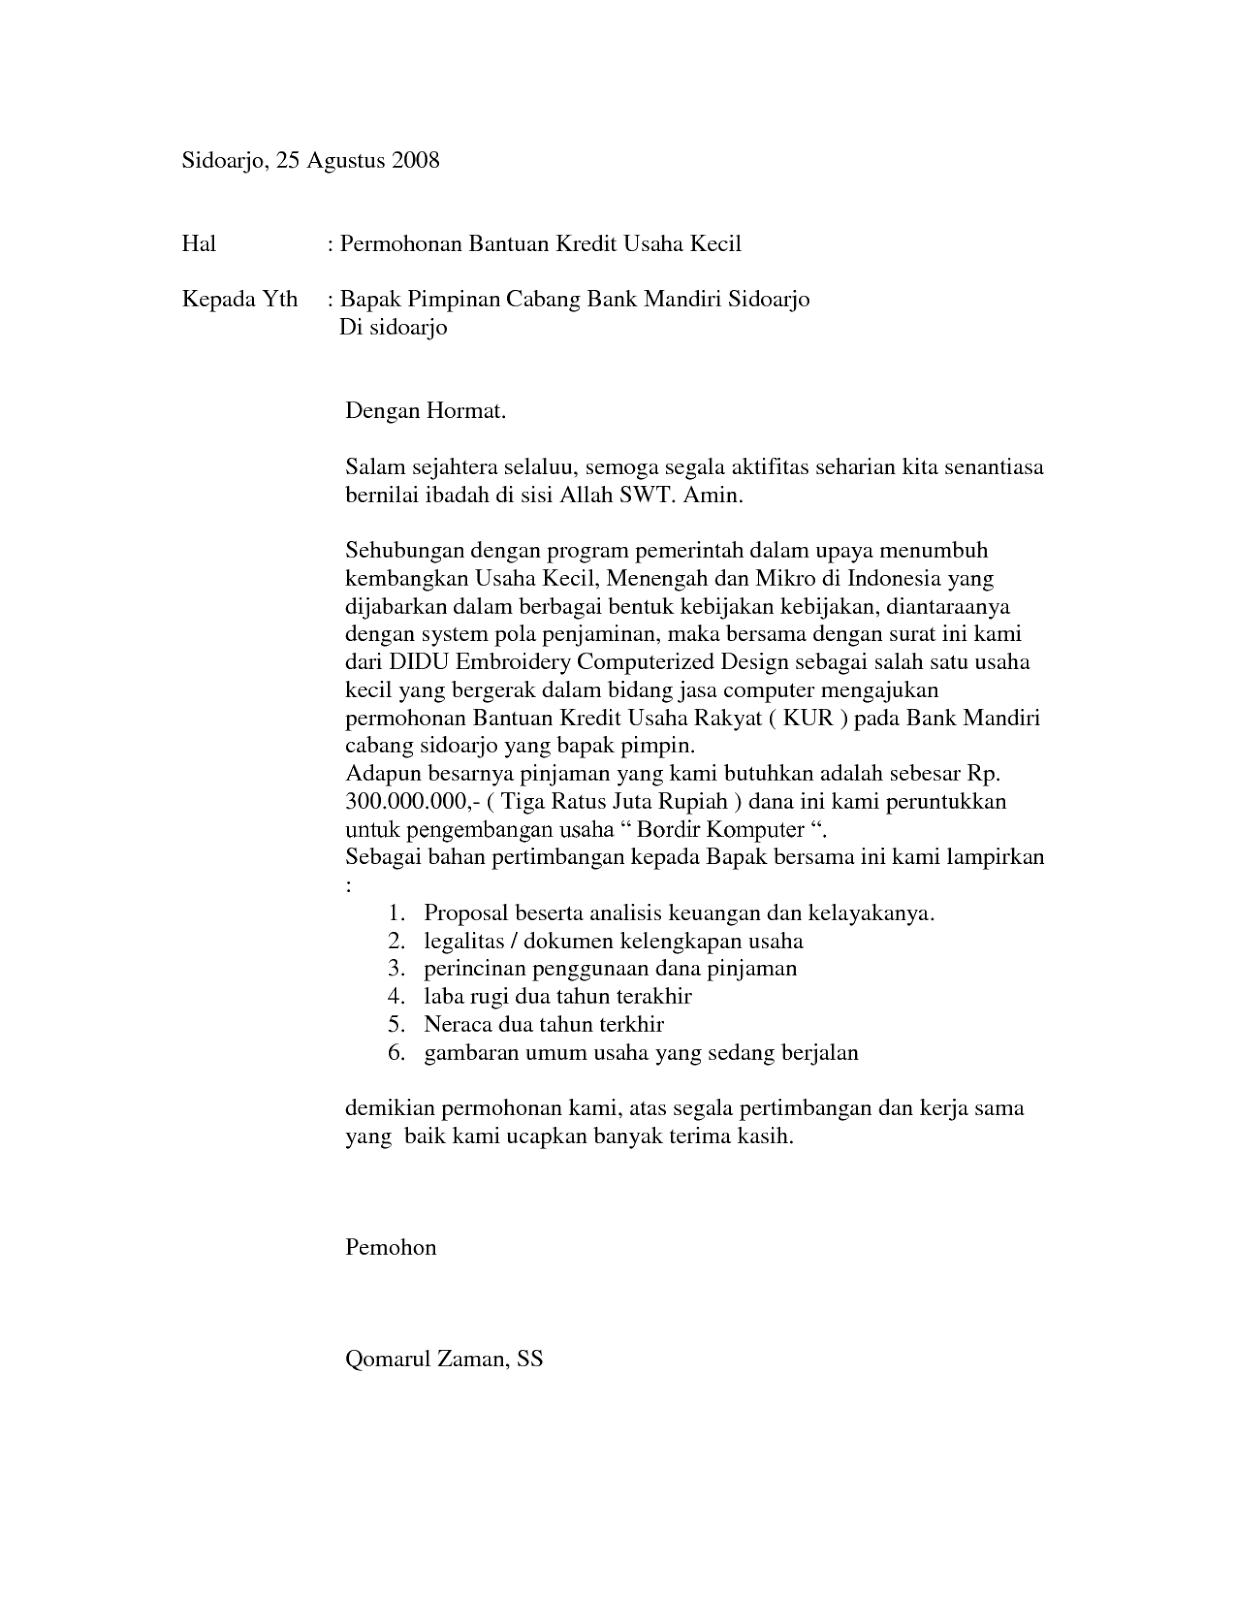 contoh surat pengajuan permohonan 2018 februari 2018